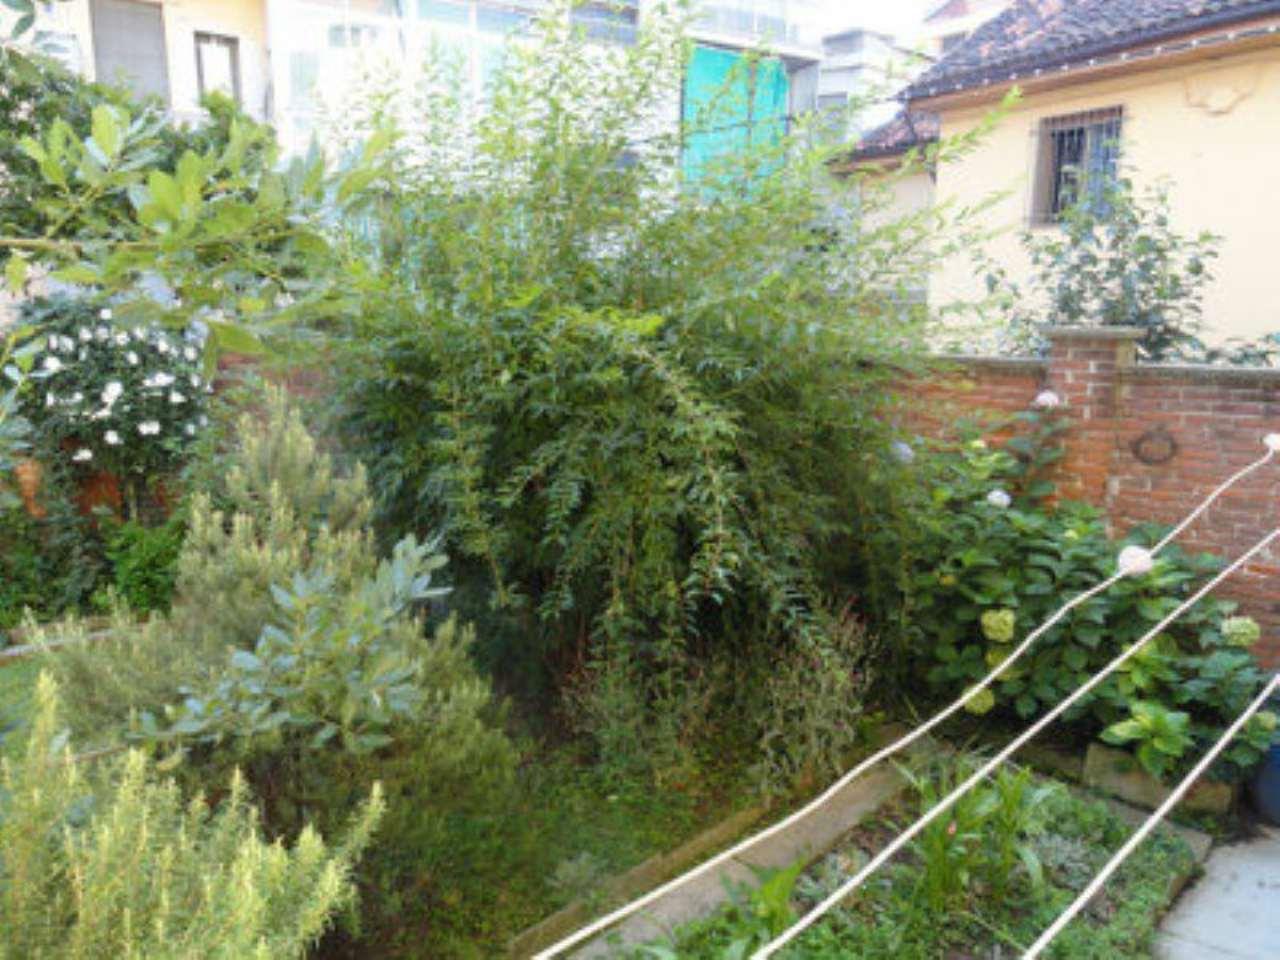 Bilocale Torino Via Verolengo 194 9